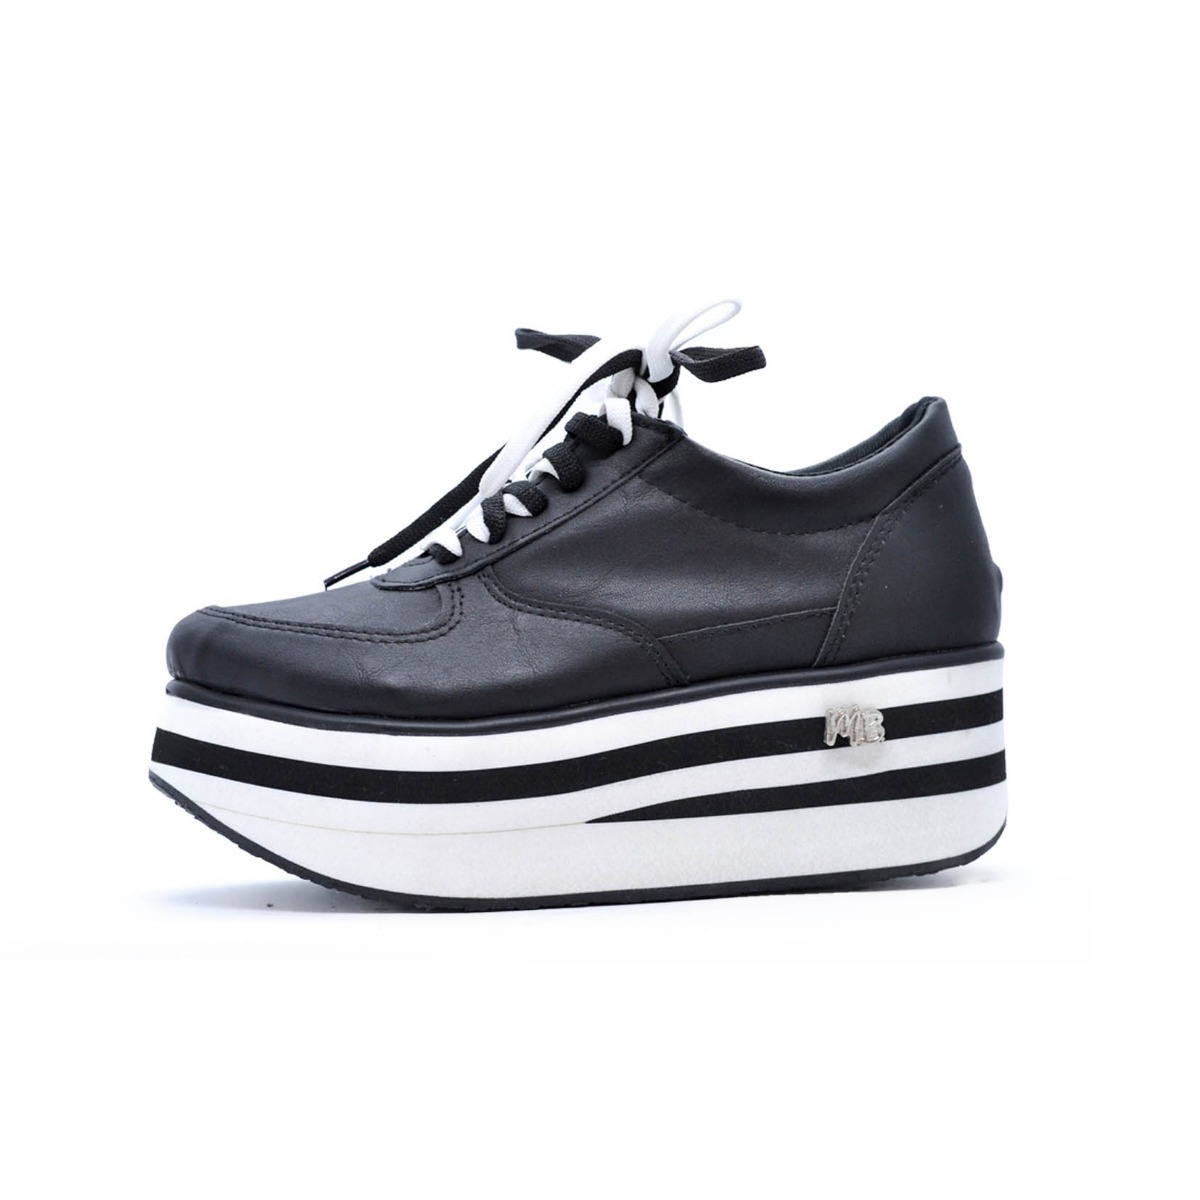 3b91cbee zapatillas sneakers mujer urbanas plataforma moda 2018 full. Cargando zoom.